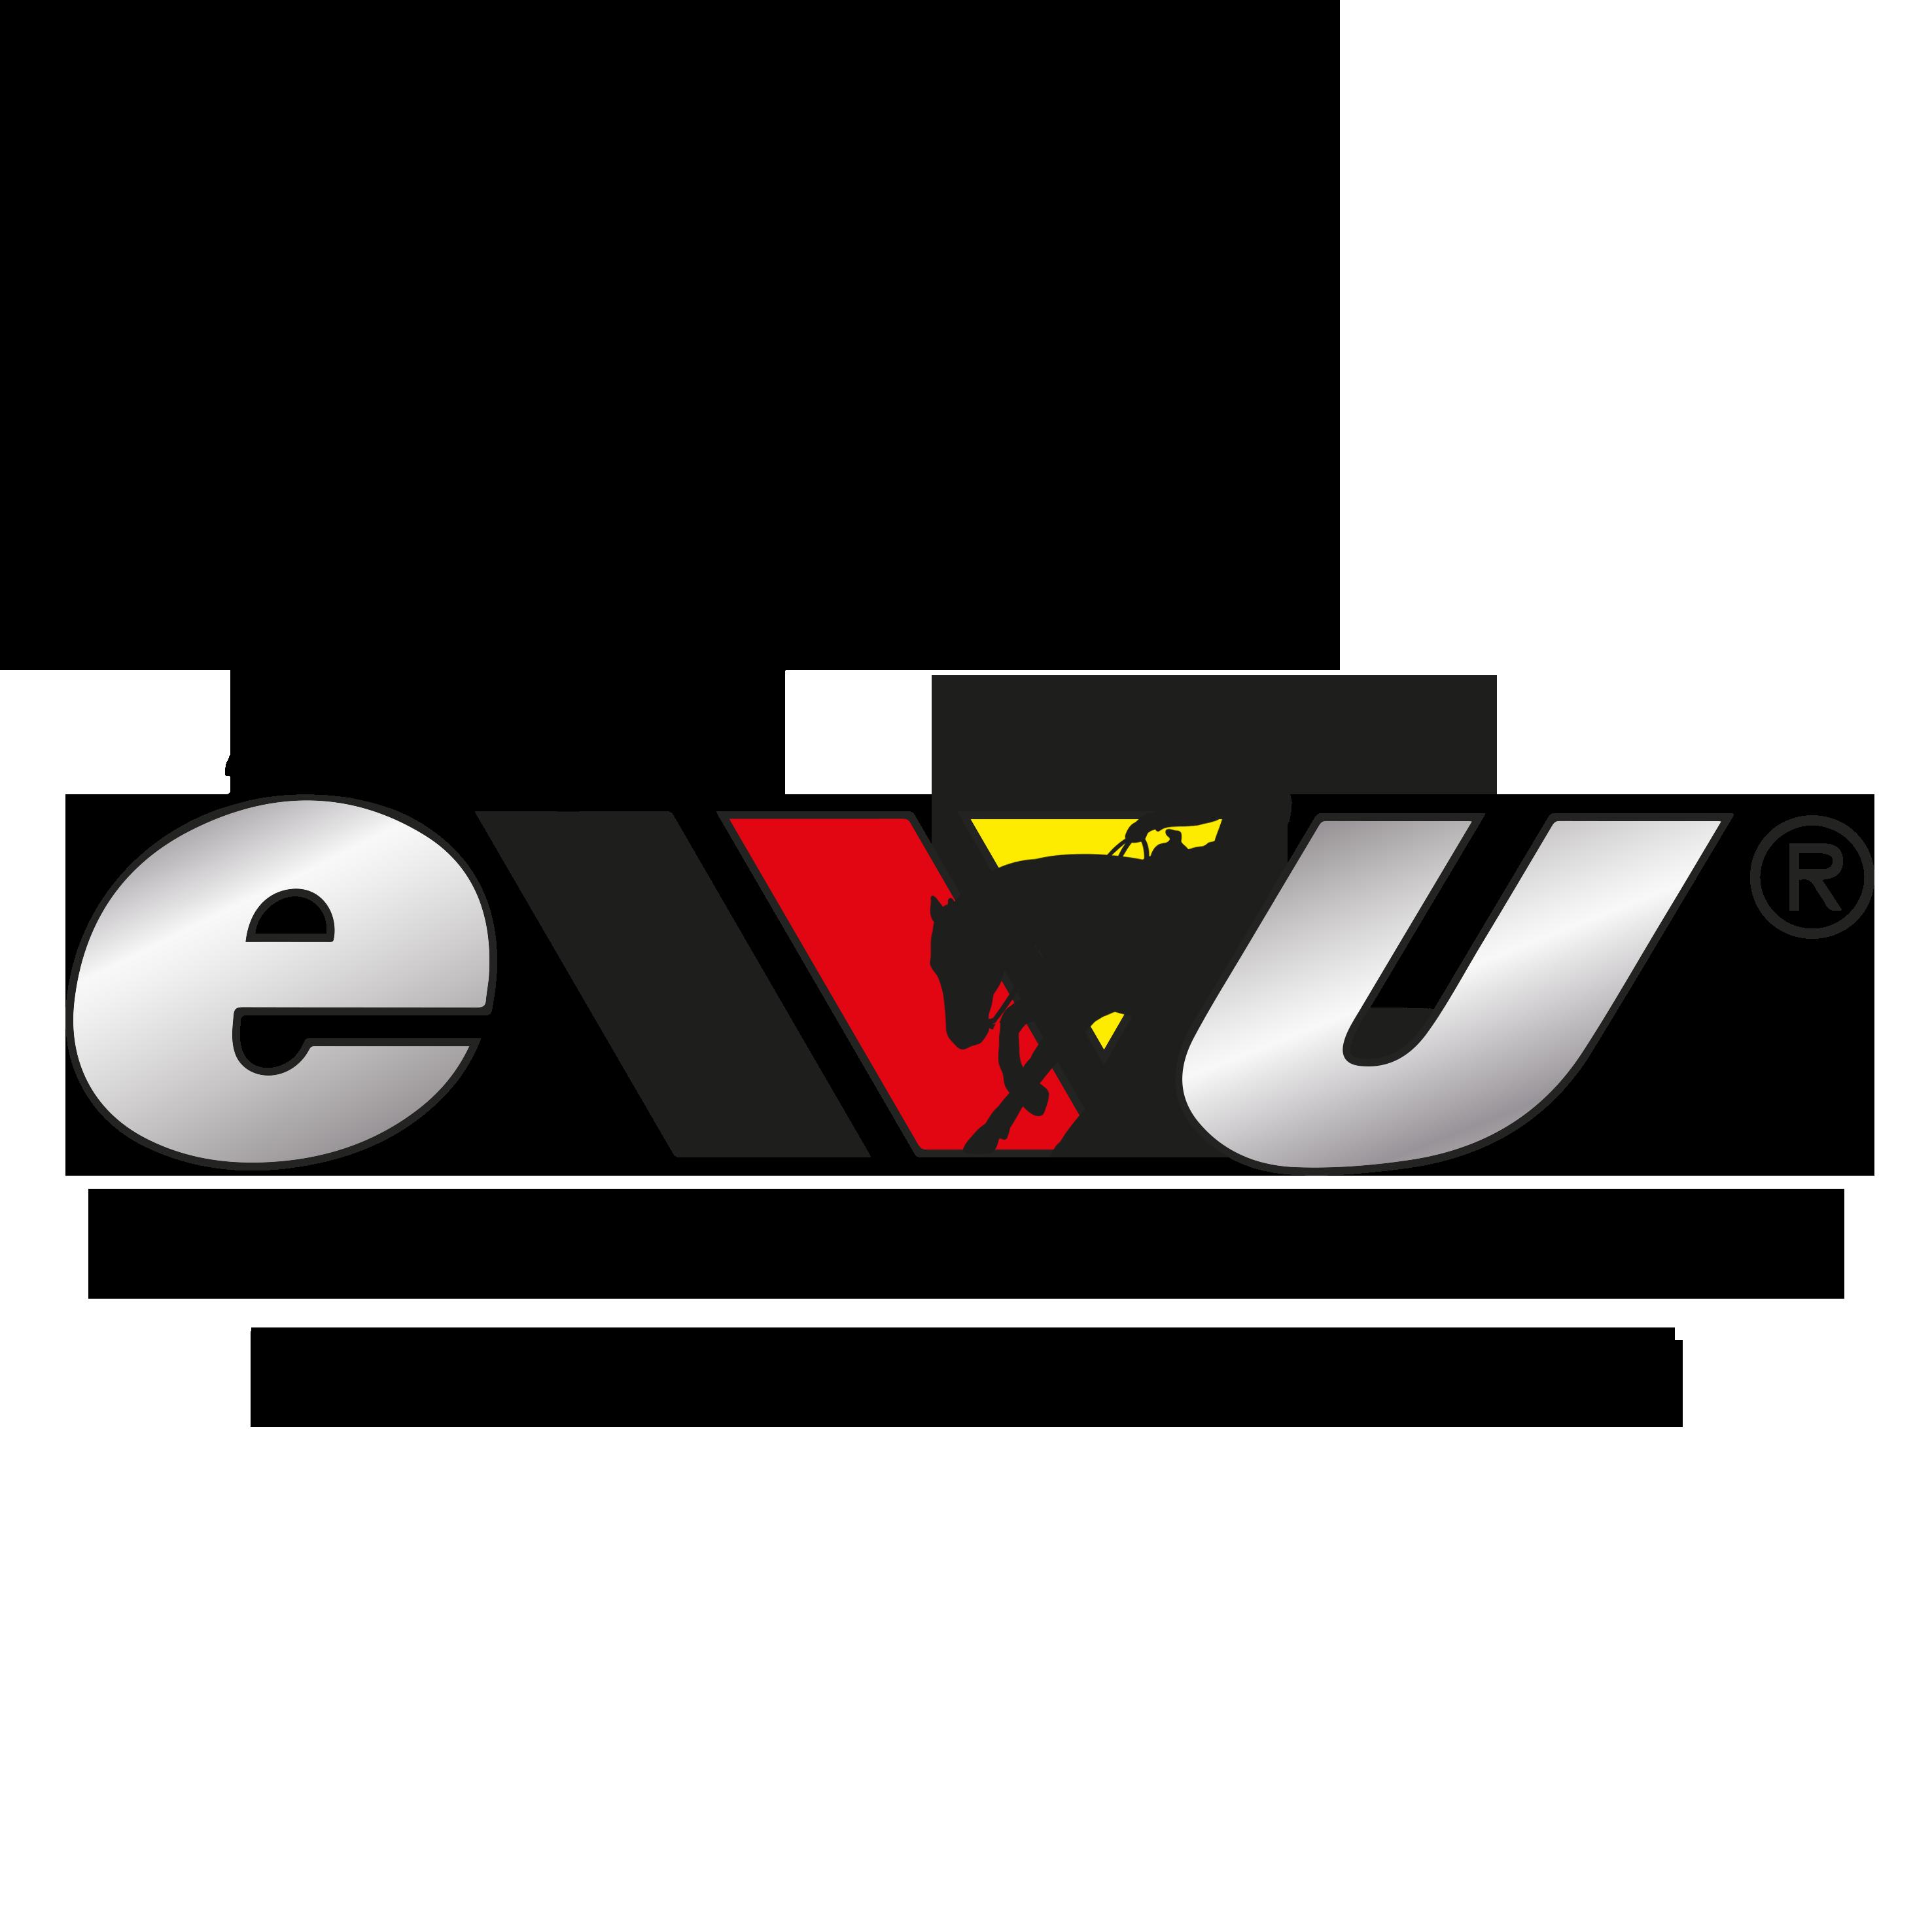 EWU Bremen Niedersachsen e.V.